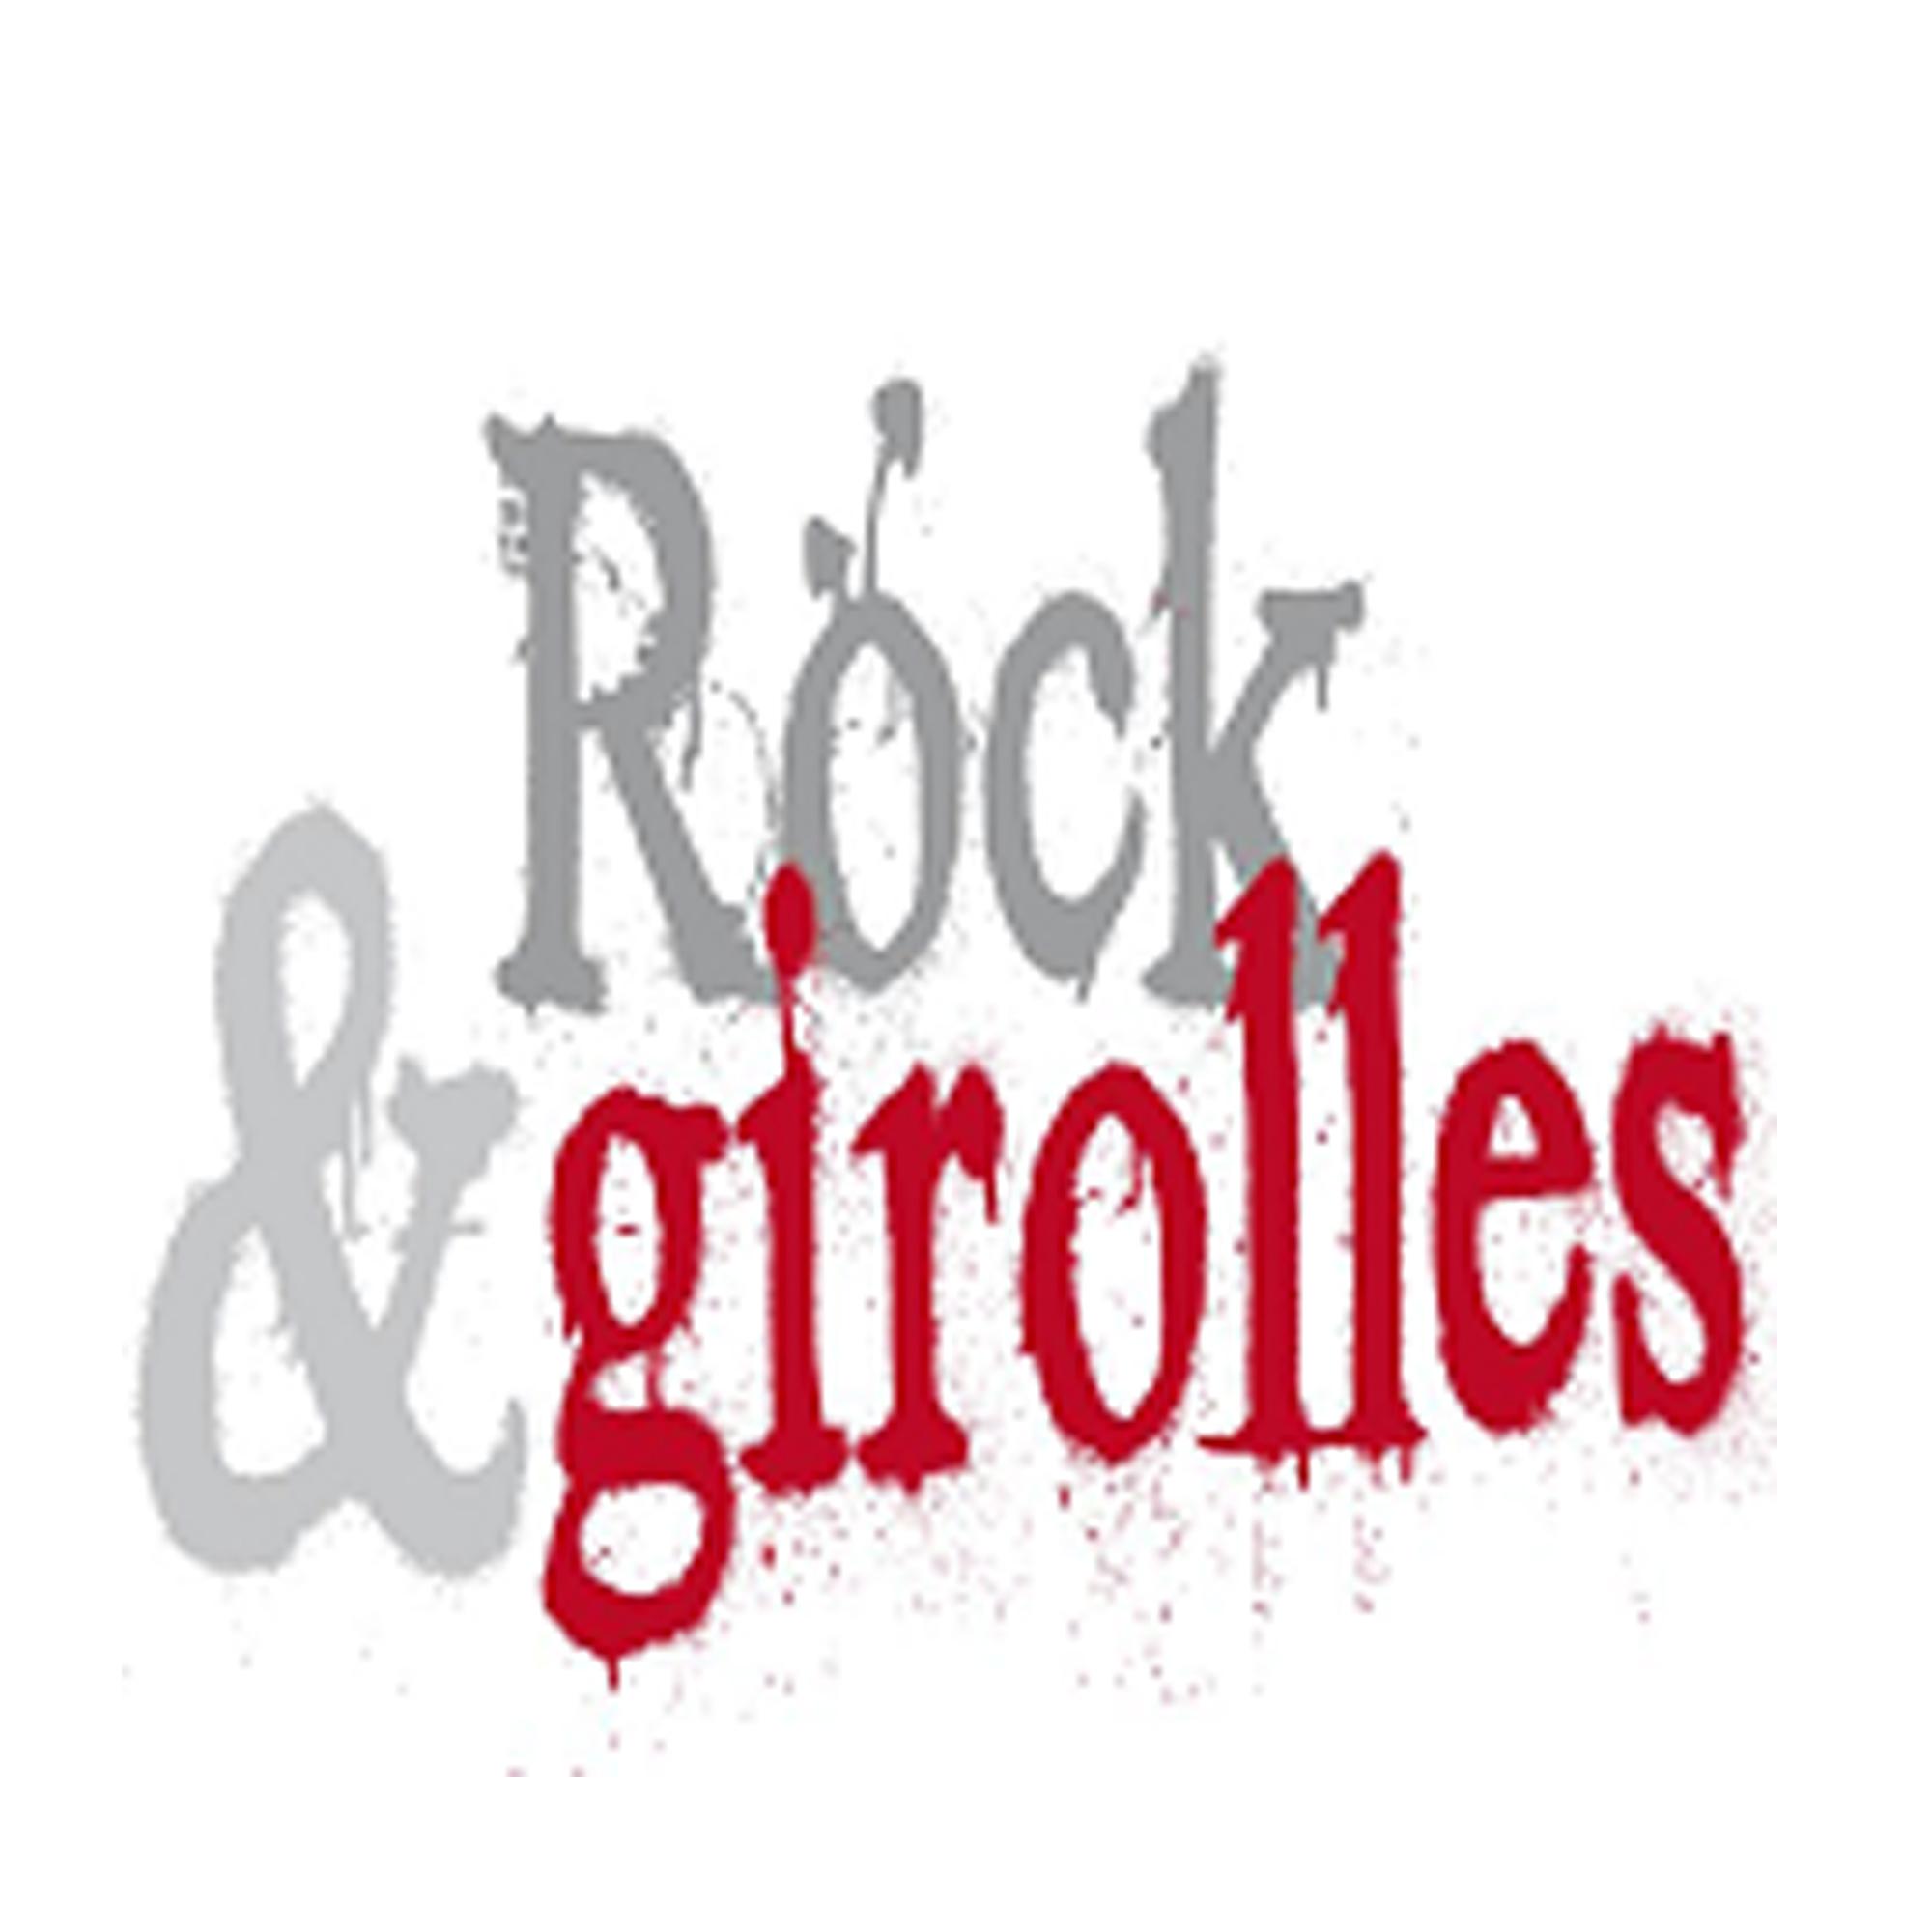 Rock & Girolles